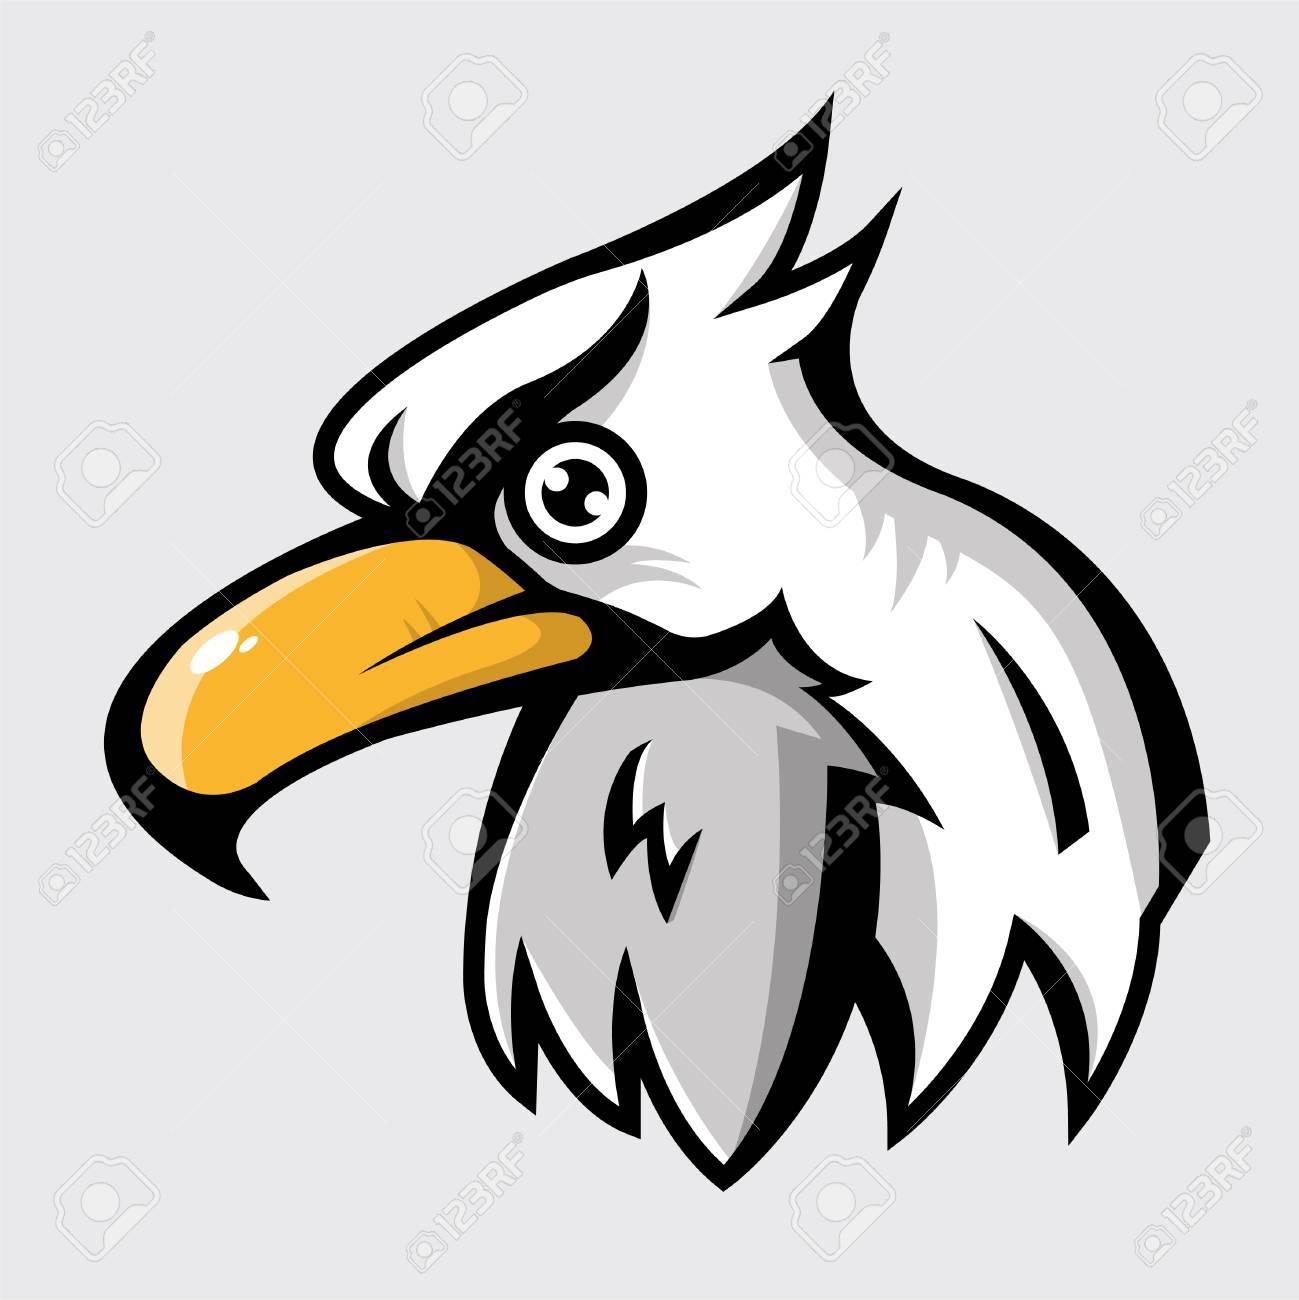 head of eagle logo vector illustration royalty free cliparts